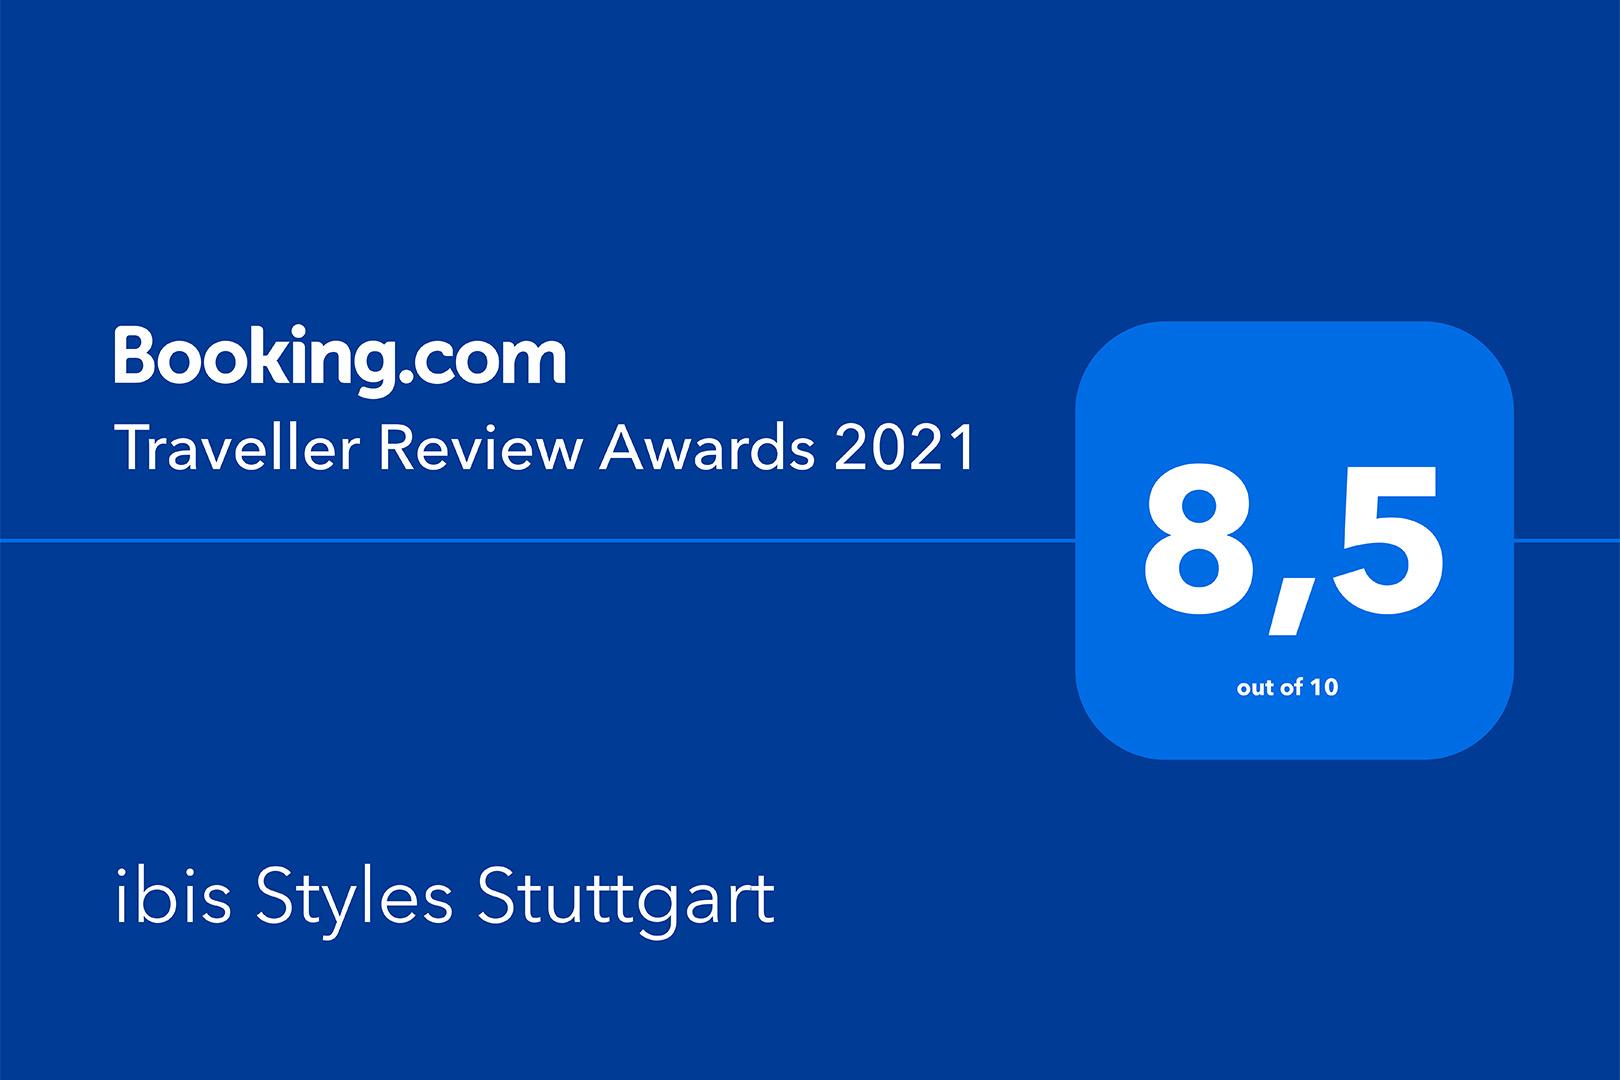 ibis Styles Stuttgart - Traveller Review Award 2021